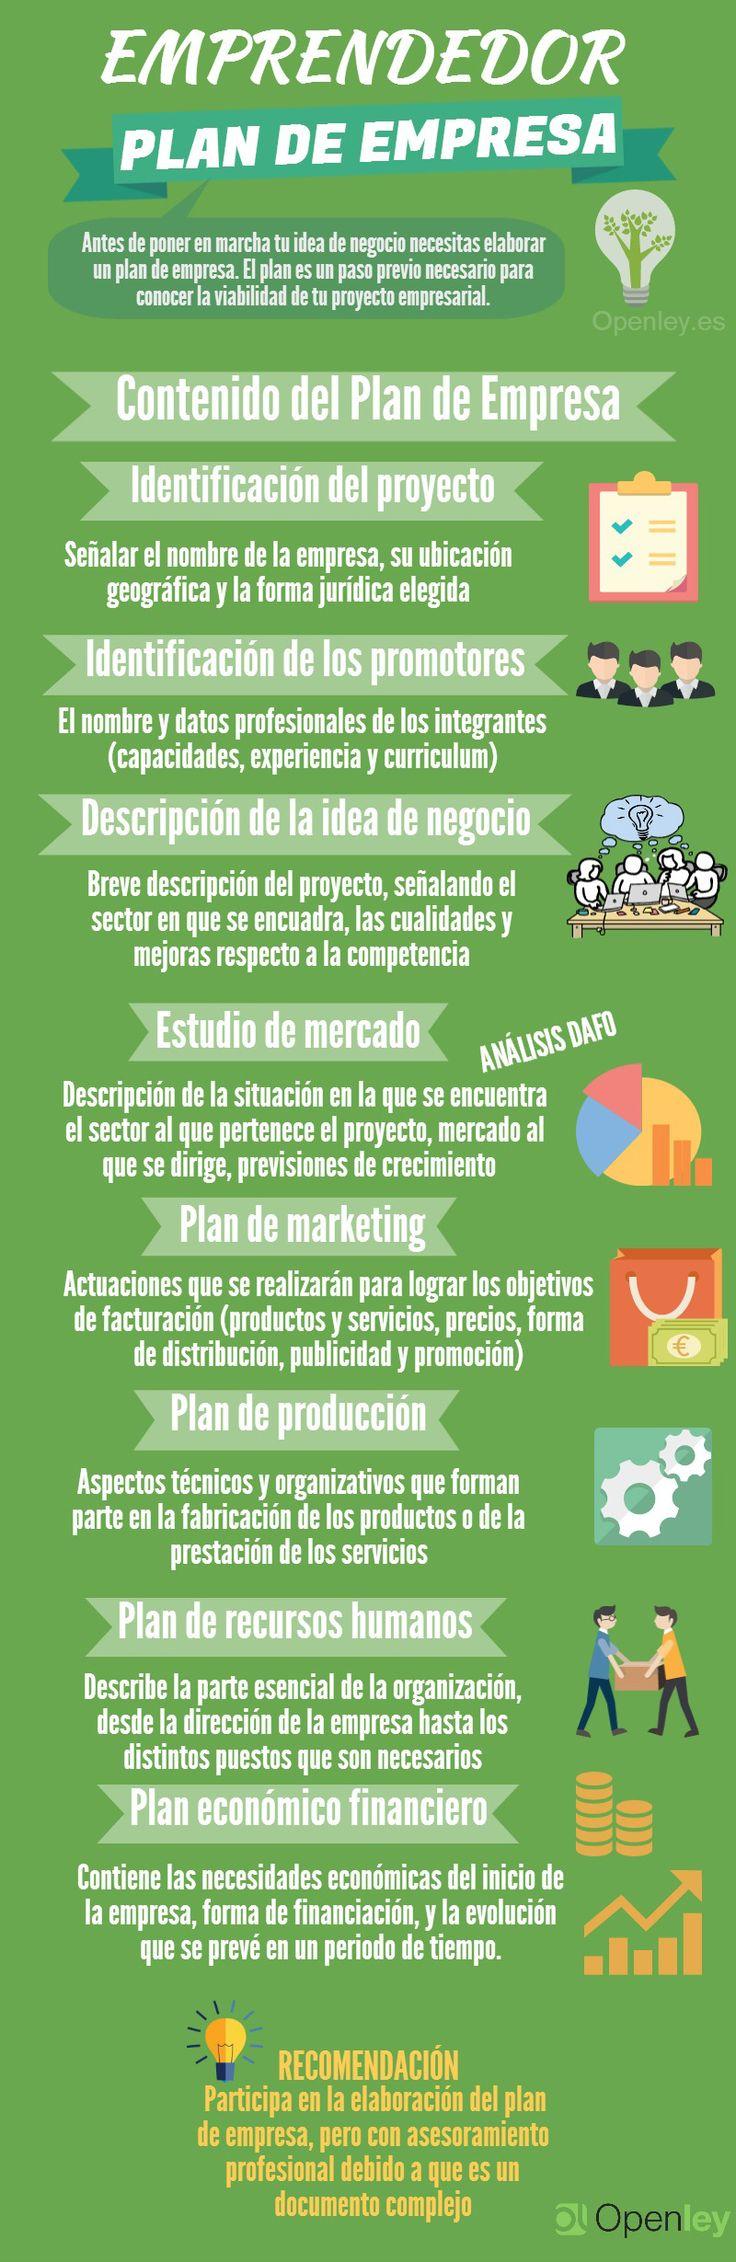 Plan de empresa #infografia #infographic #entrepreneurship #emprender